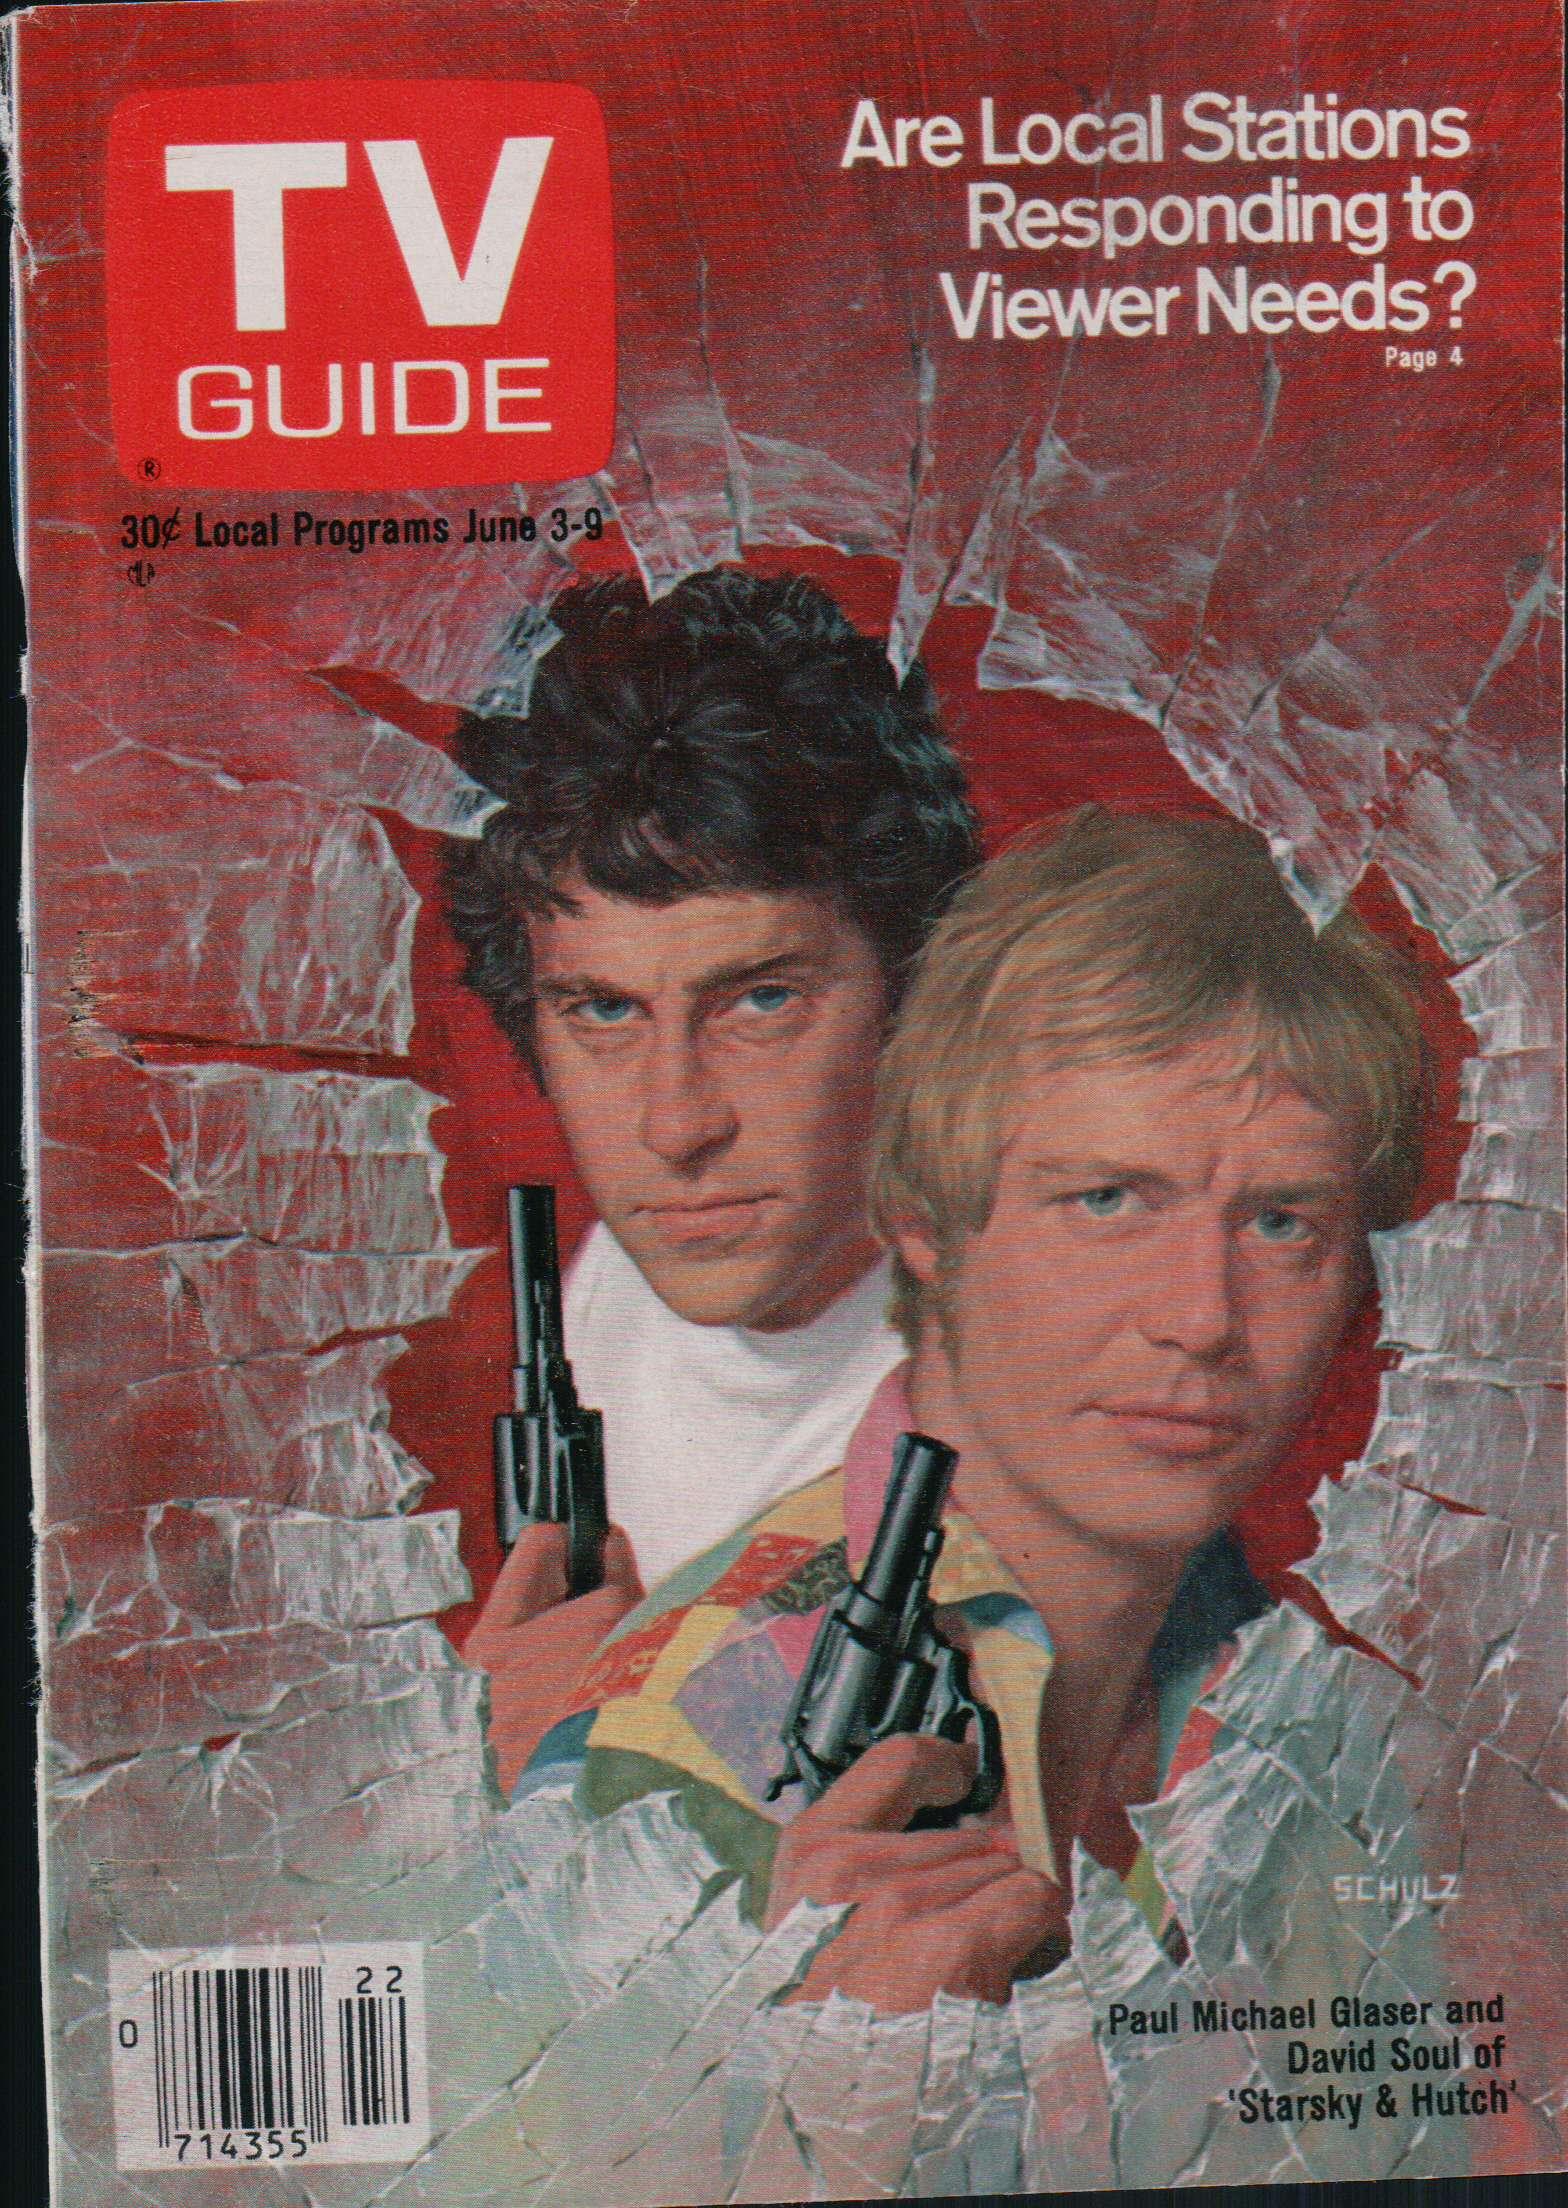 Starsky-Hutch-David-Soul-Paul-Michael-Glaser-wallpaper-wp429352